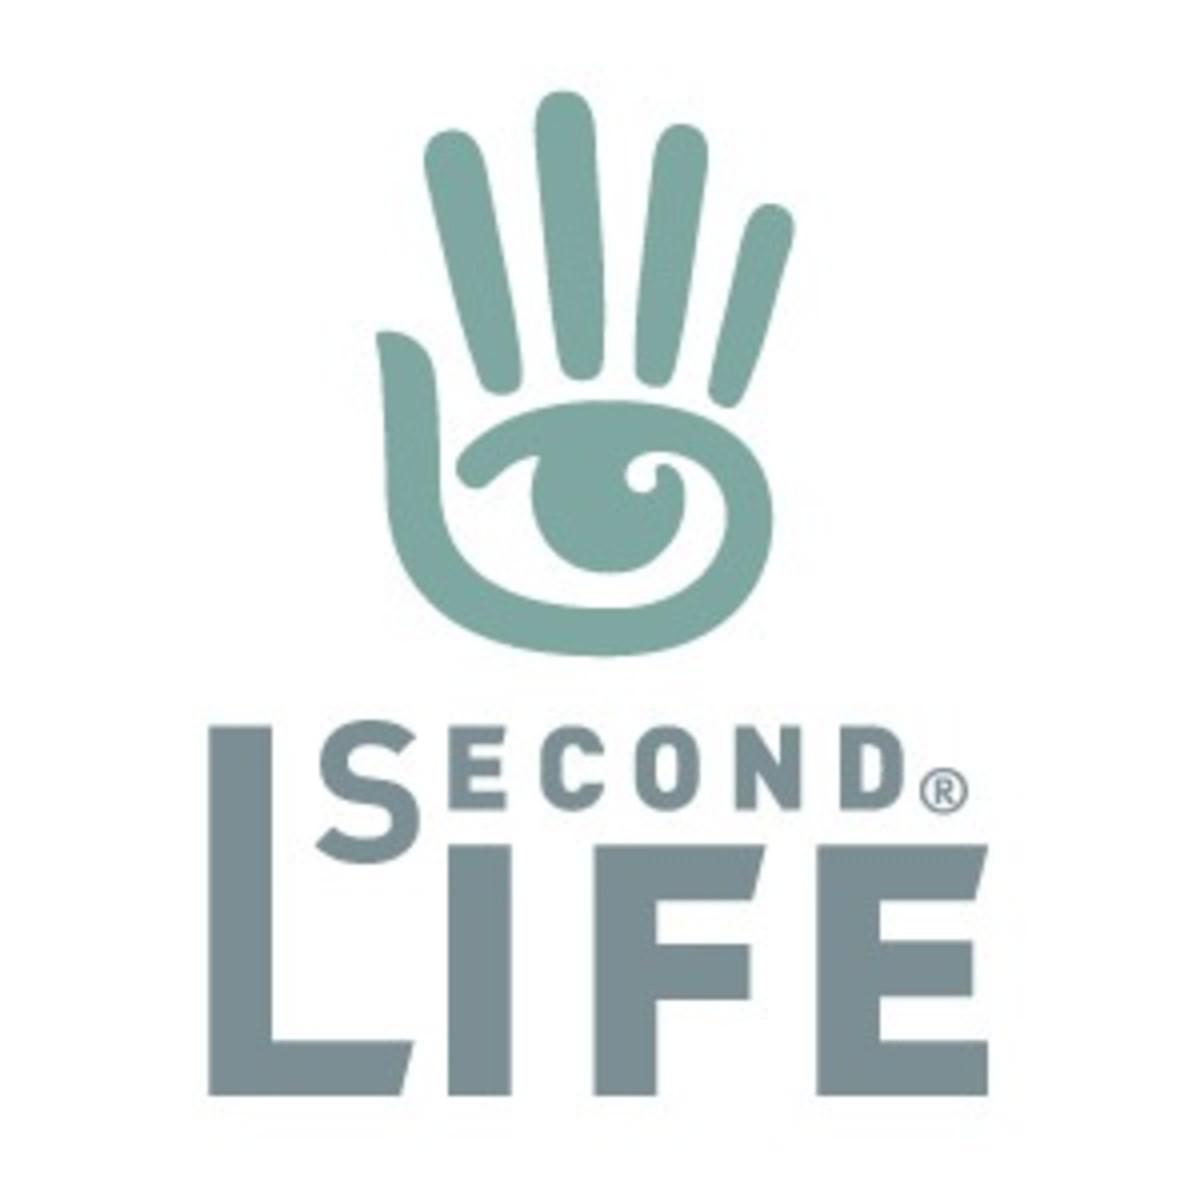 Second Life logo.